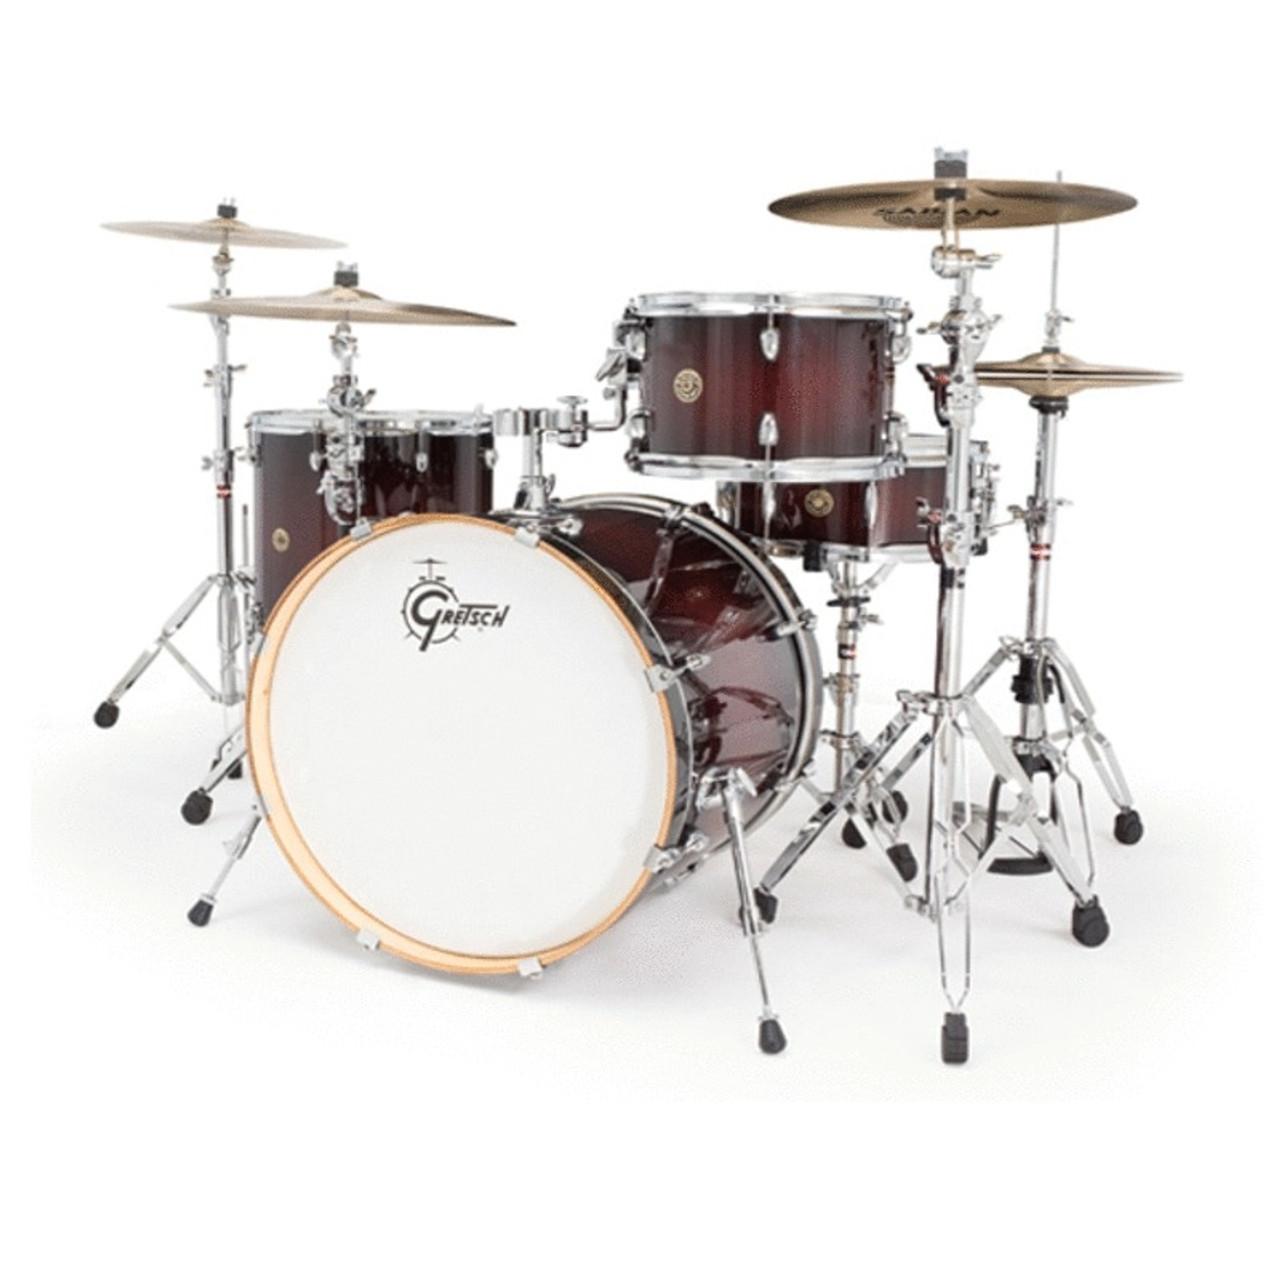 "Drum Batter Head Gretsch Tom 8/"" Clear"